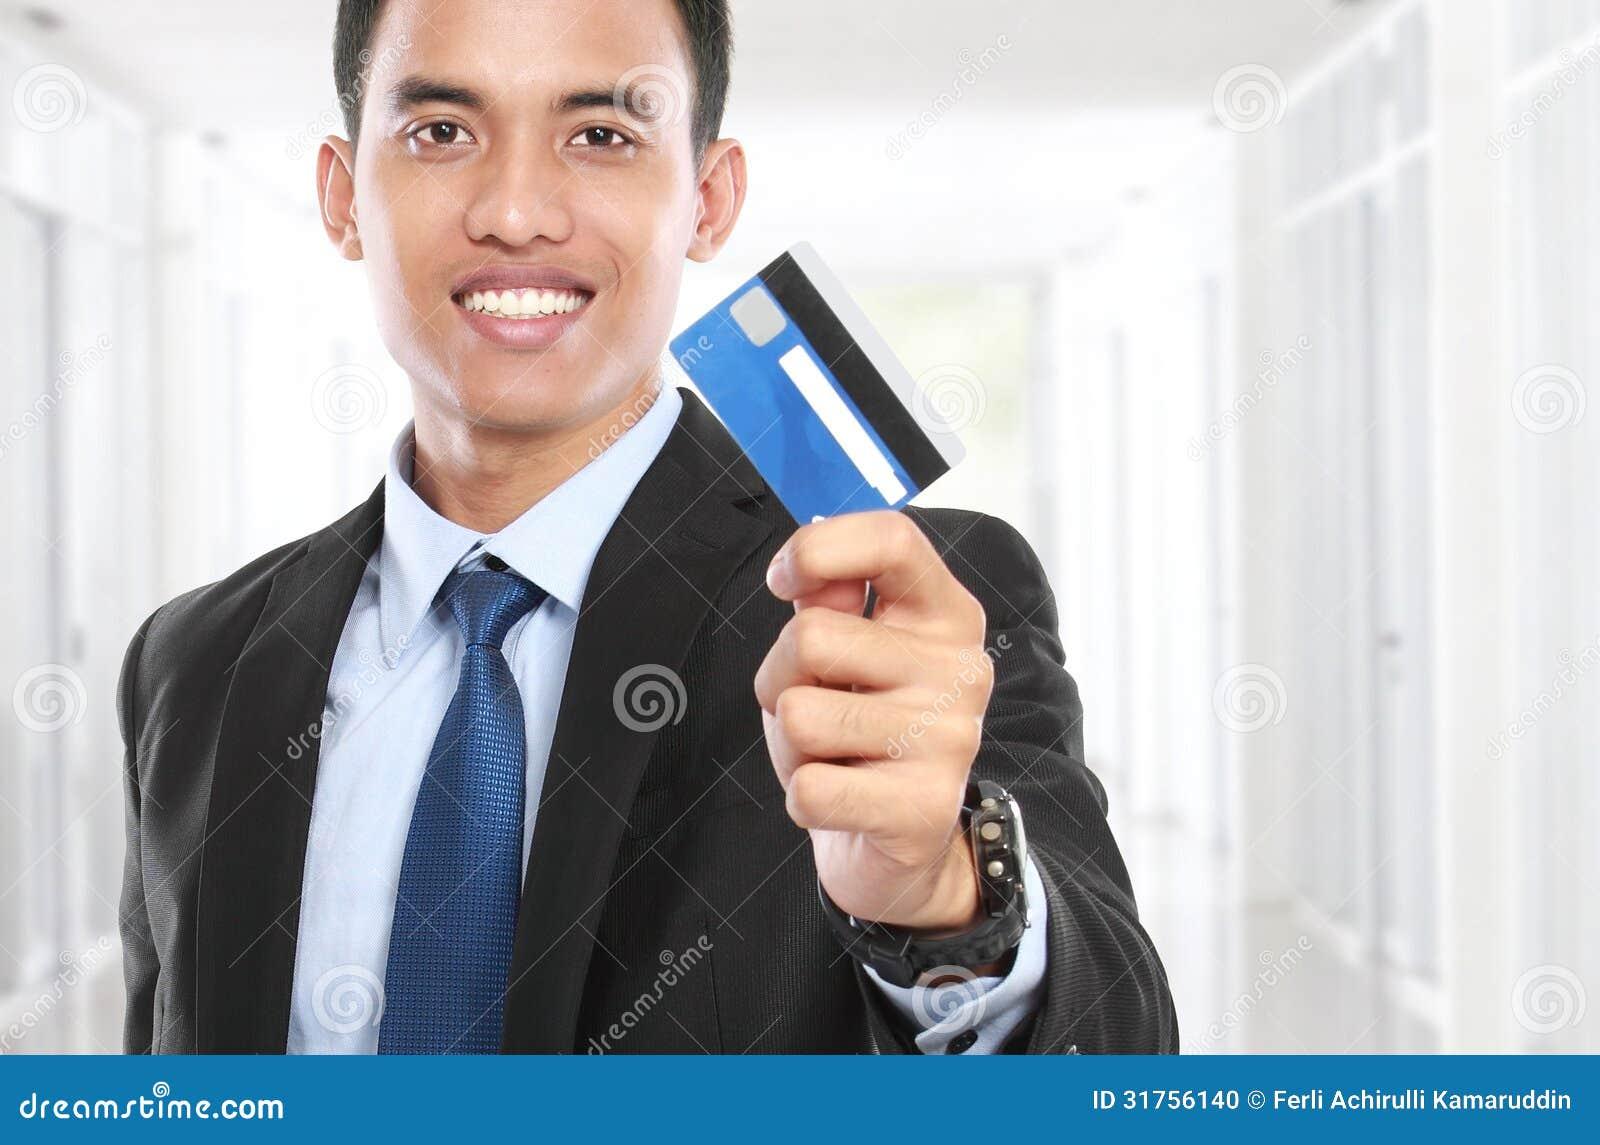 Бизнесмен держа кредитную карточку и улыбку